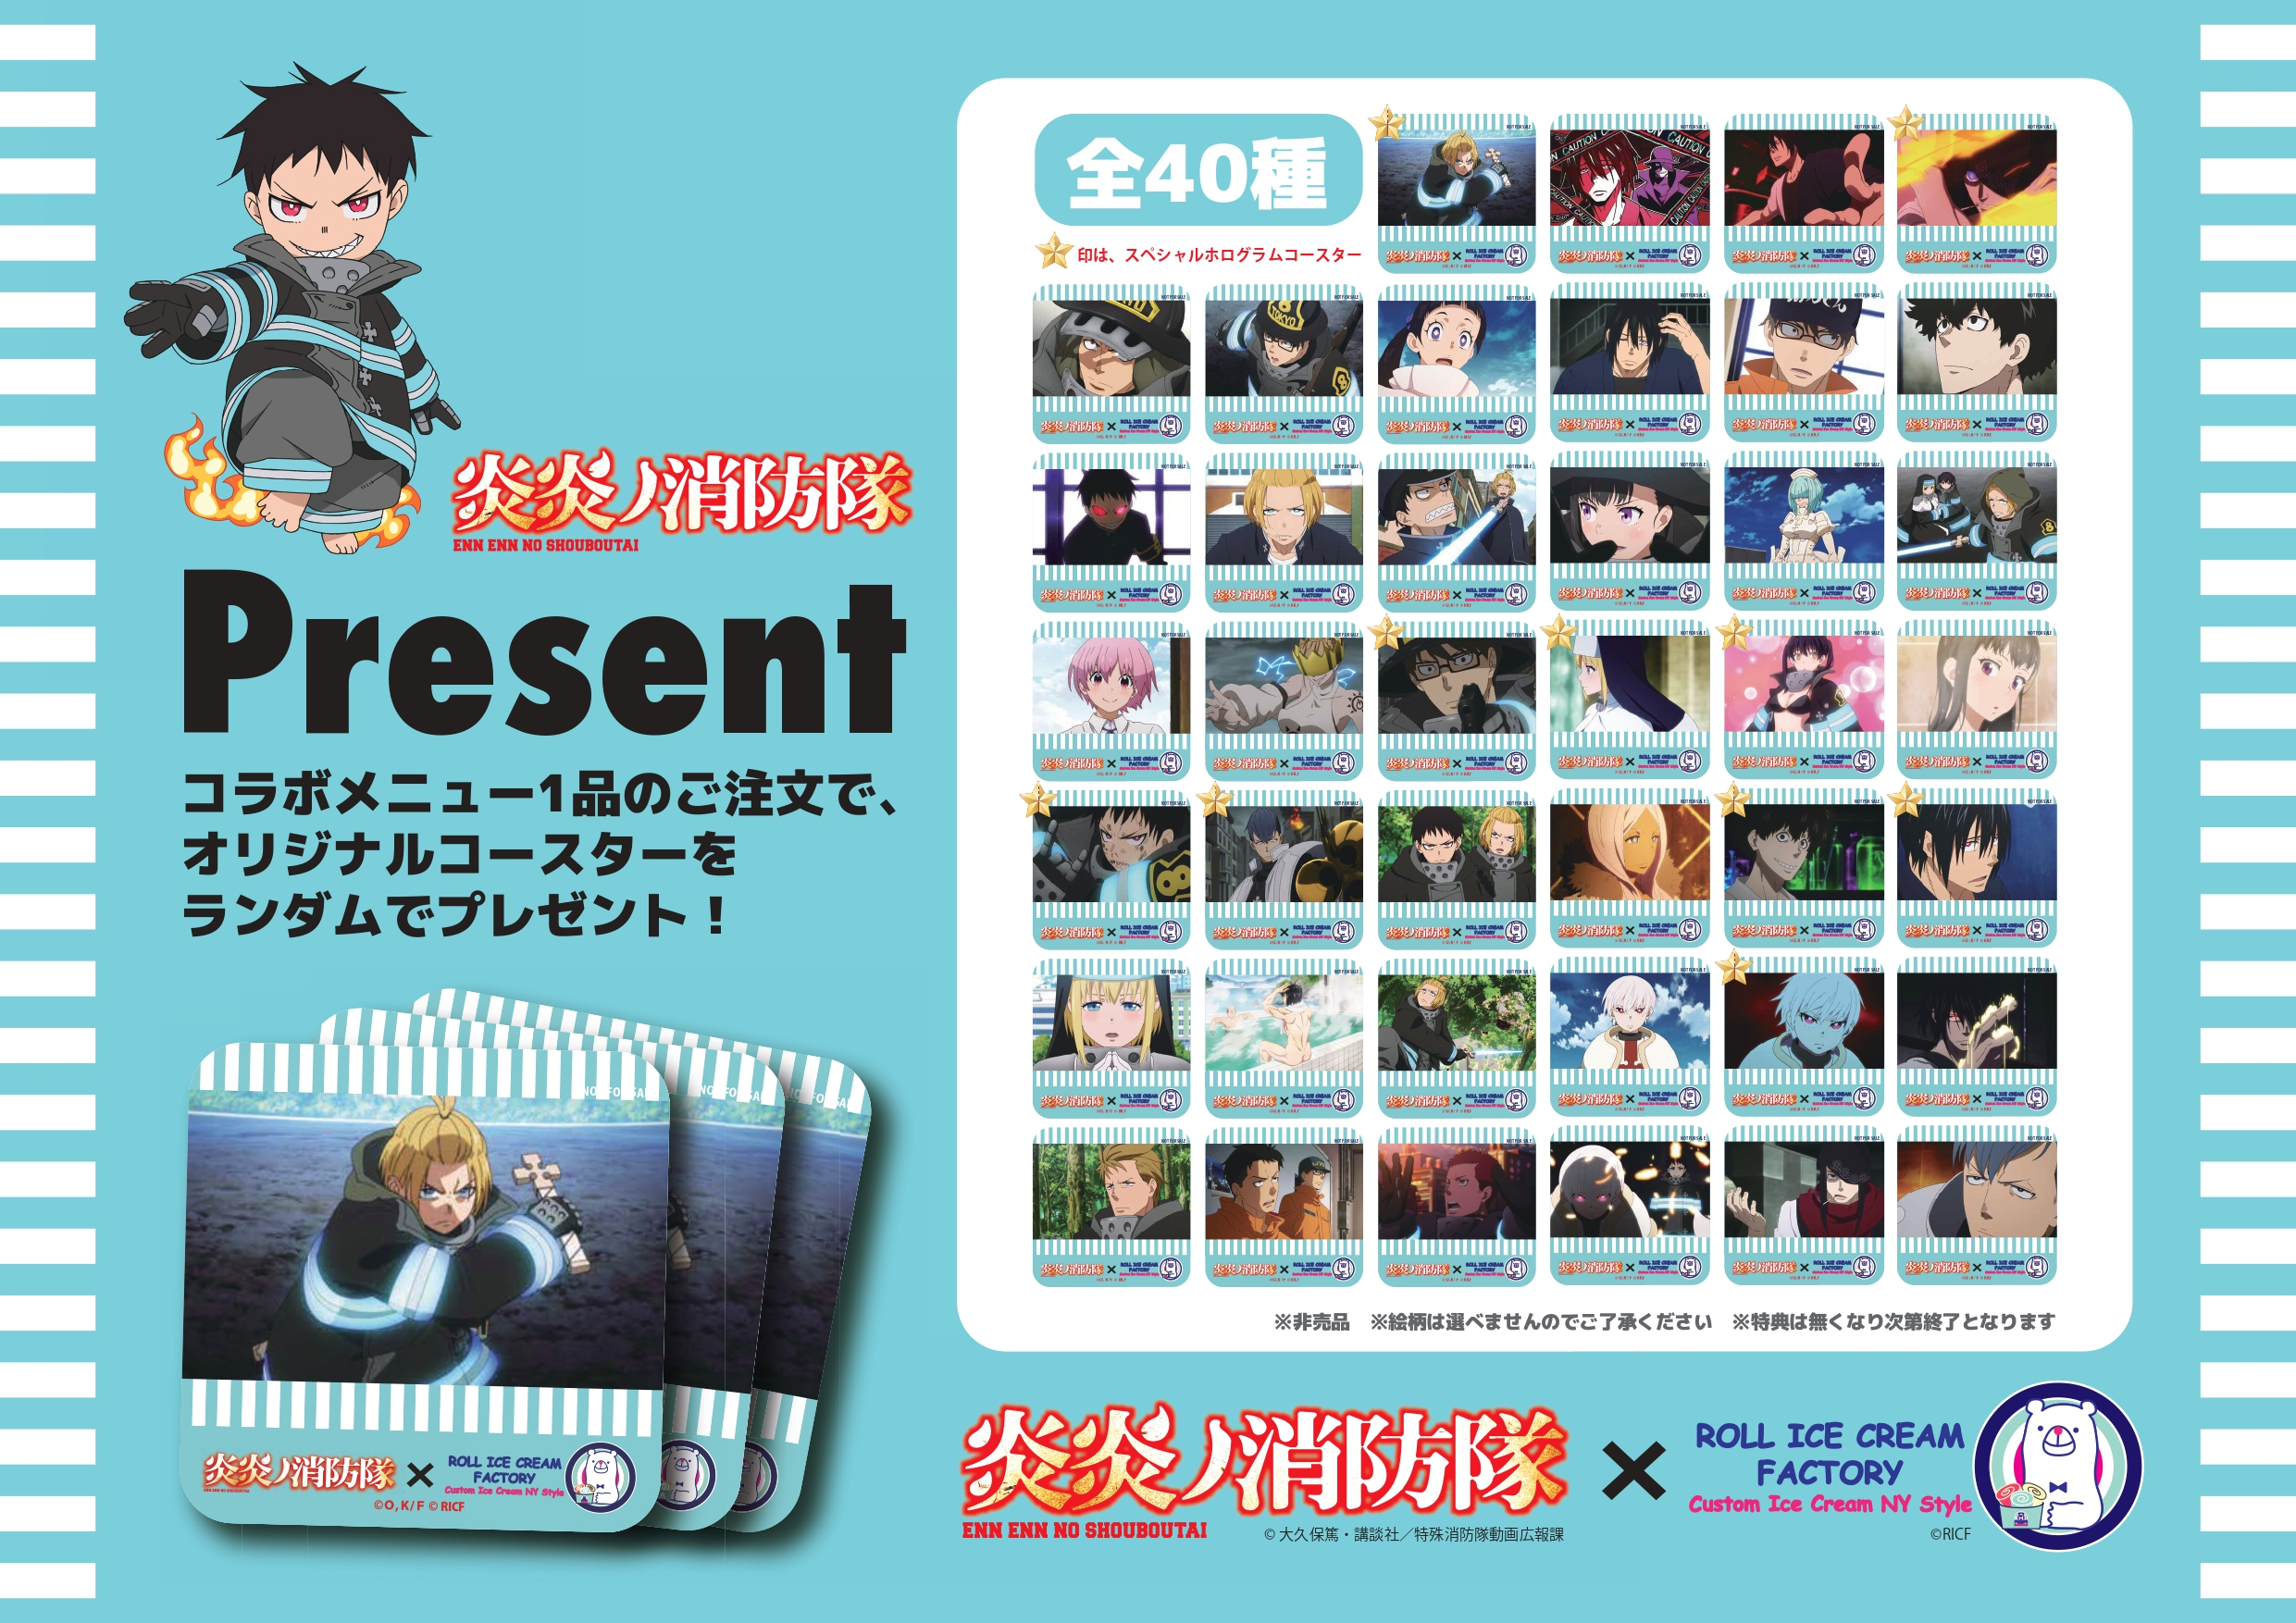 TVアニメ「炎炎ノ消防隊 弐ノ章」×「ROLL ICE CREAM FACTORY」新春開運コラボカフェ コースター